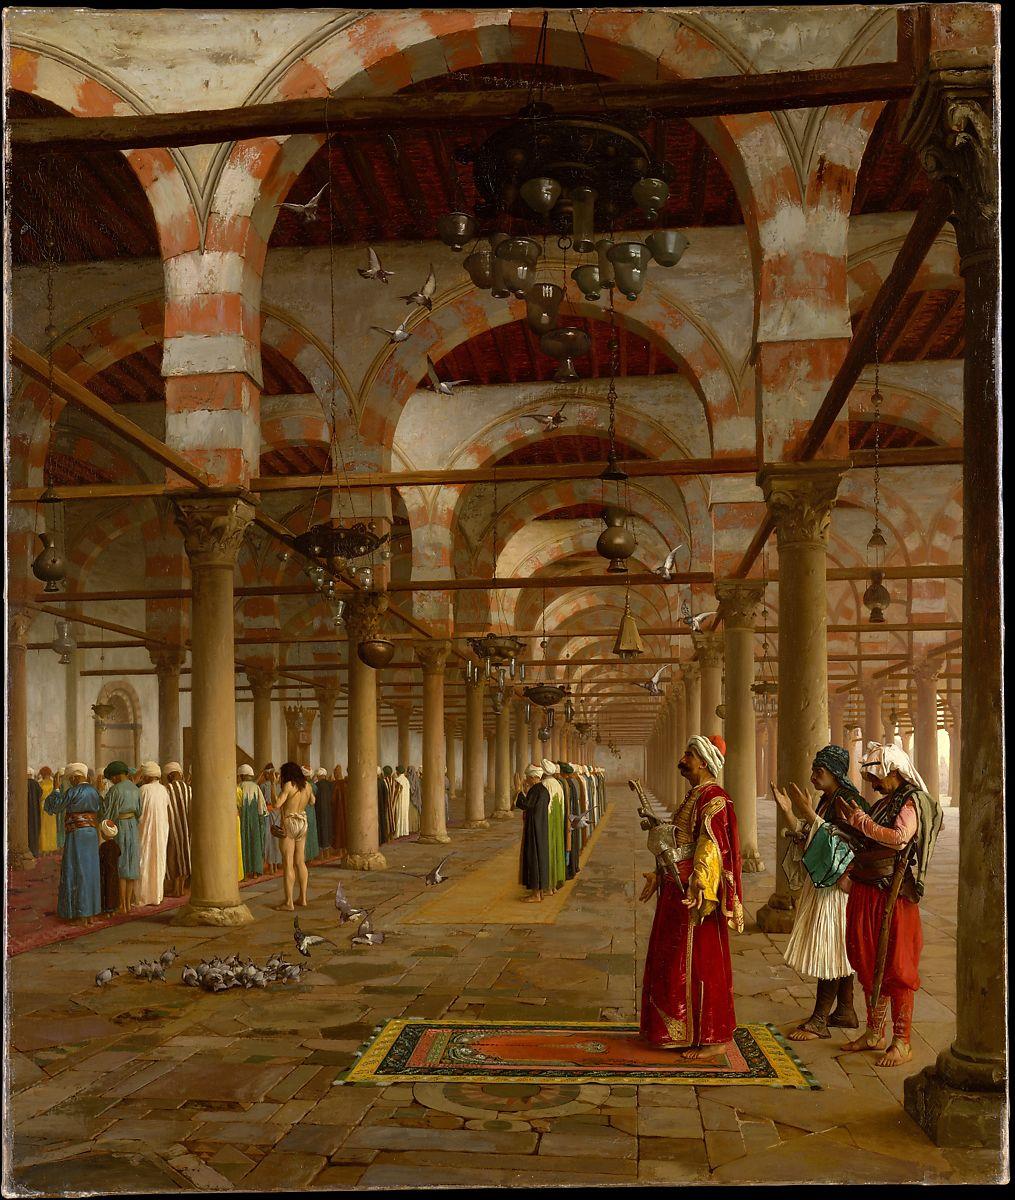 Jean-Léon Gérôme: Prayer in the Mosque, 1871